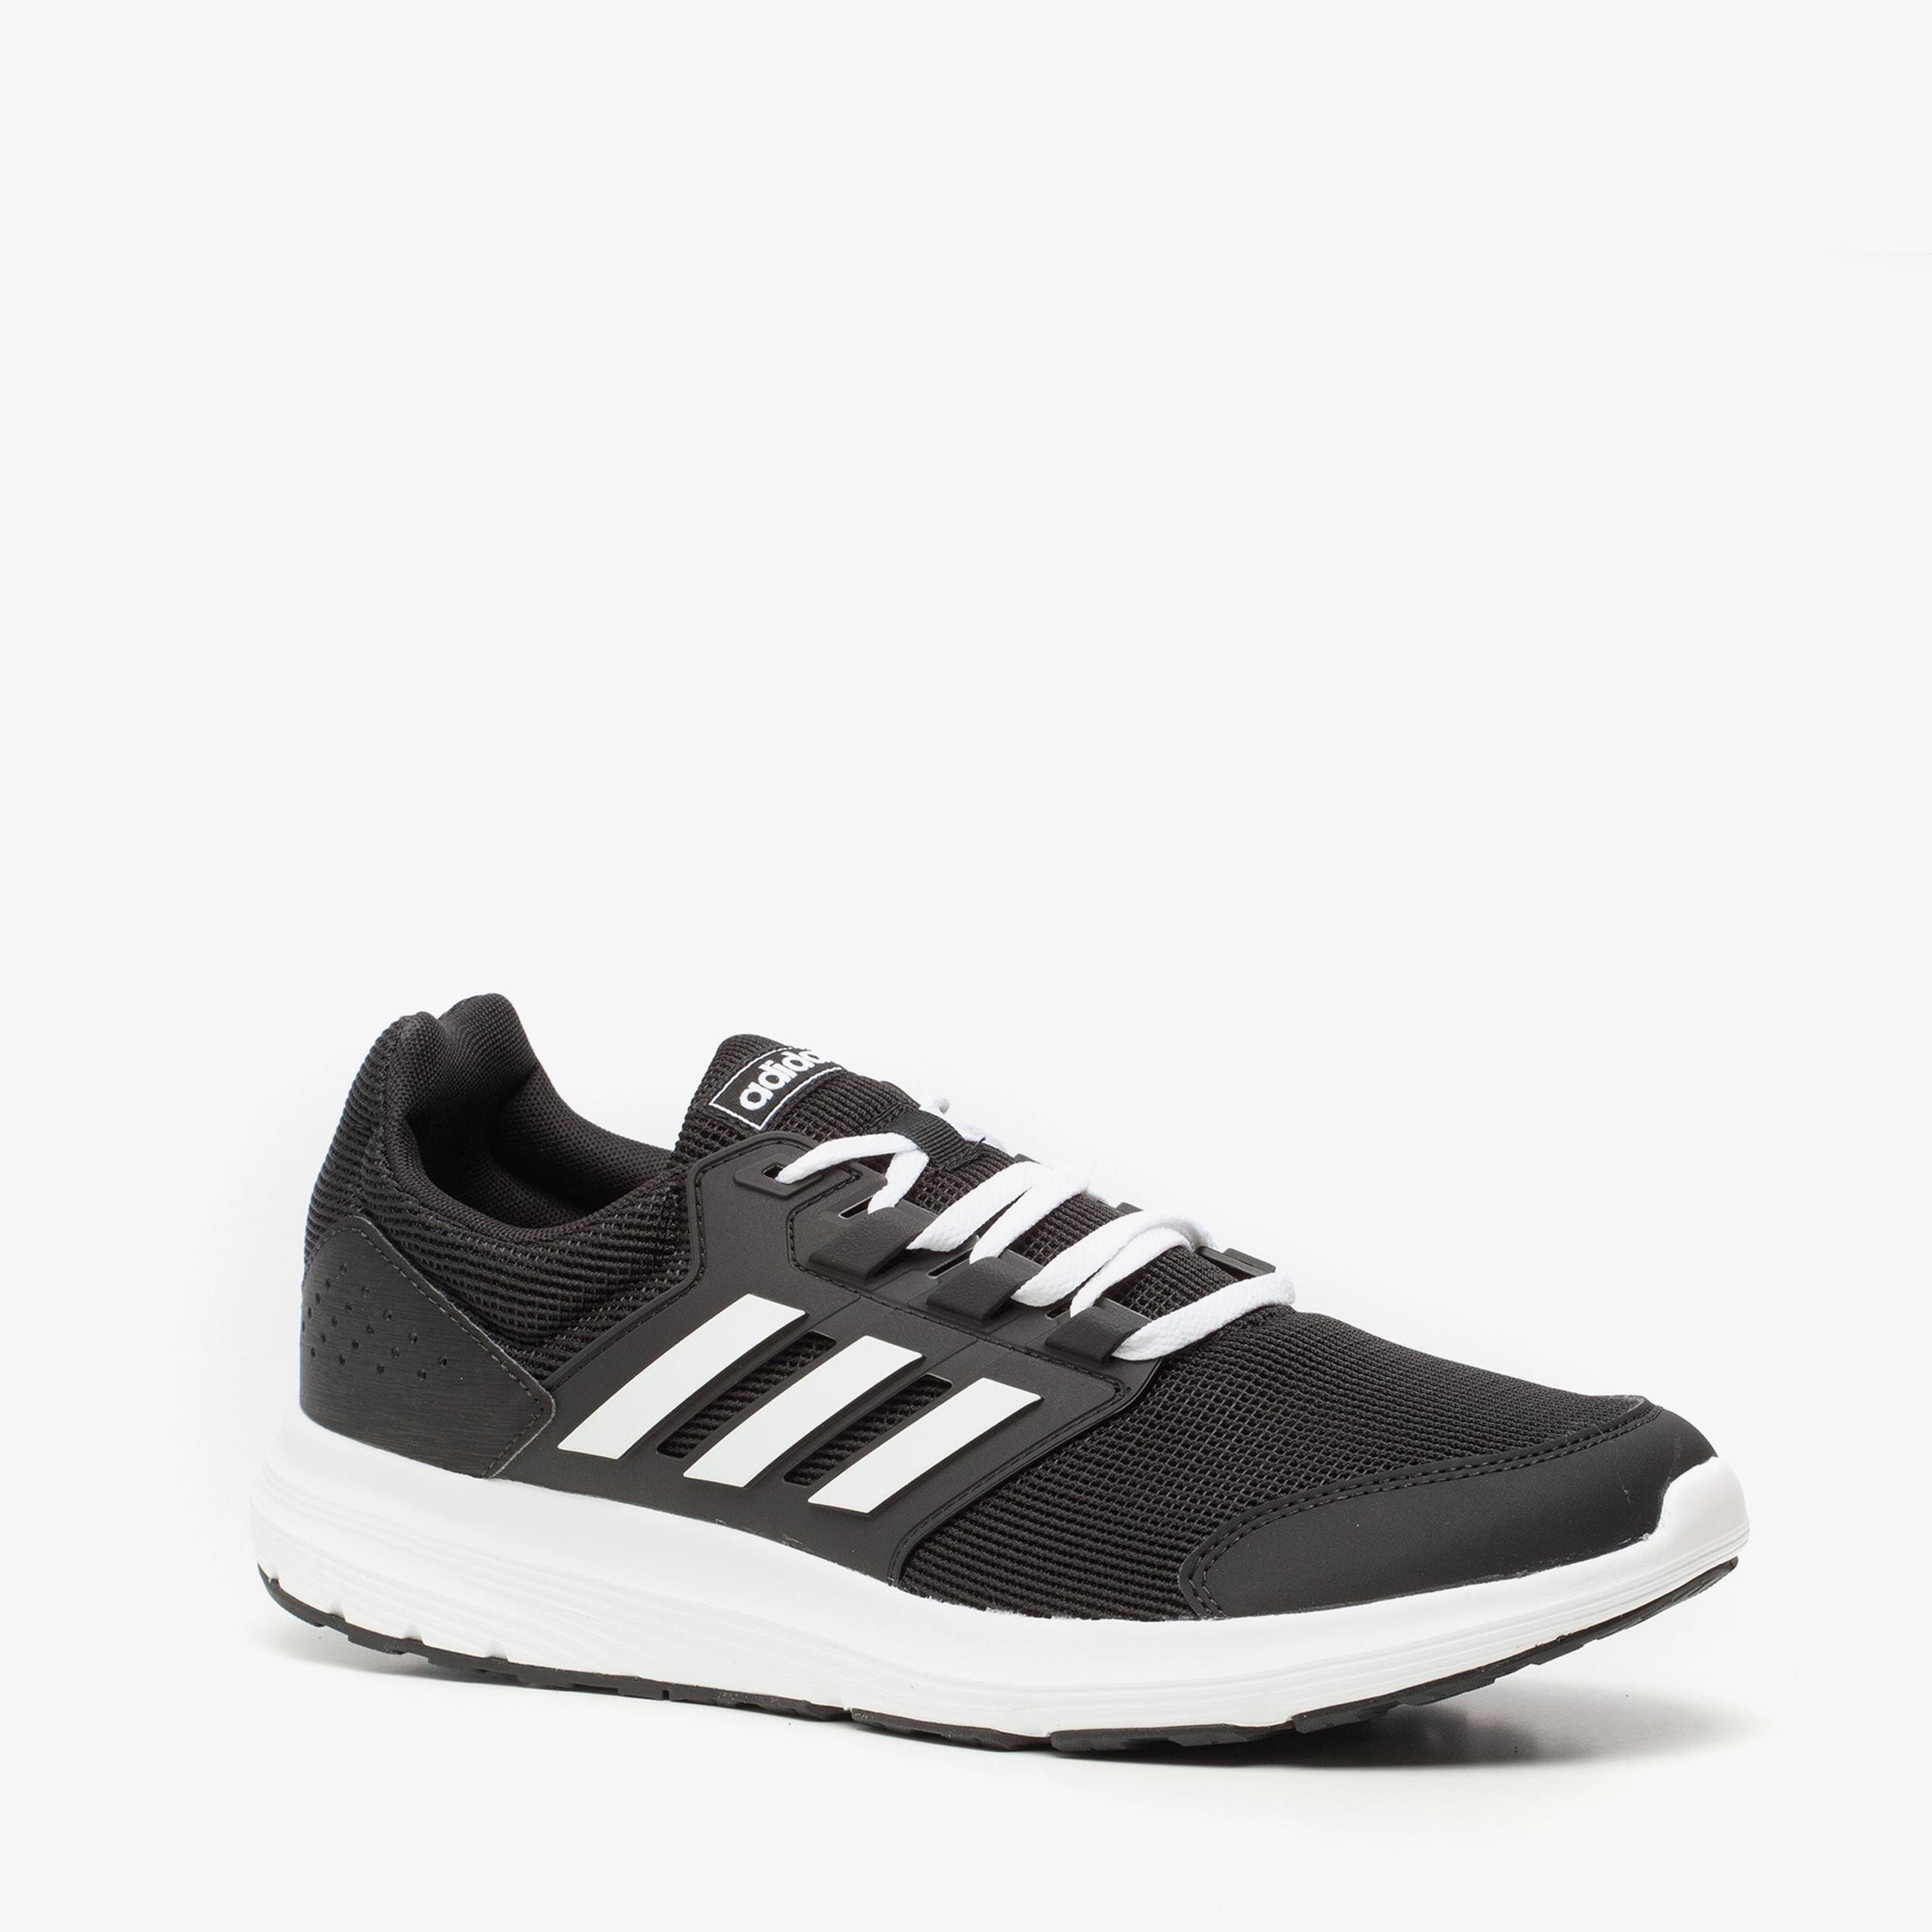 Adidas Galaxy 4 heren sportschoenen | Scapino.nl